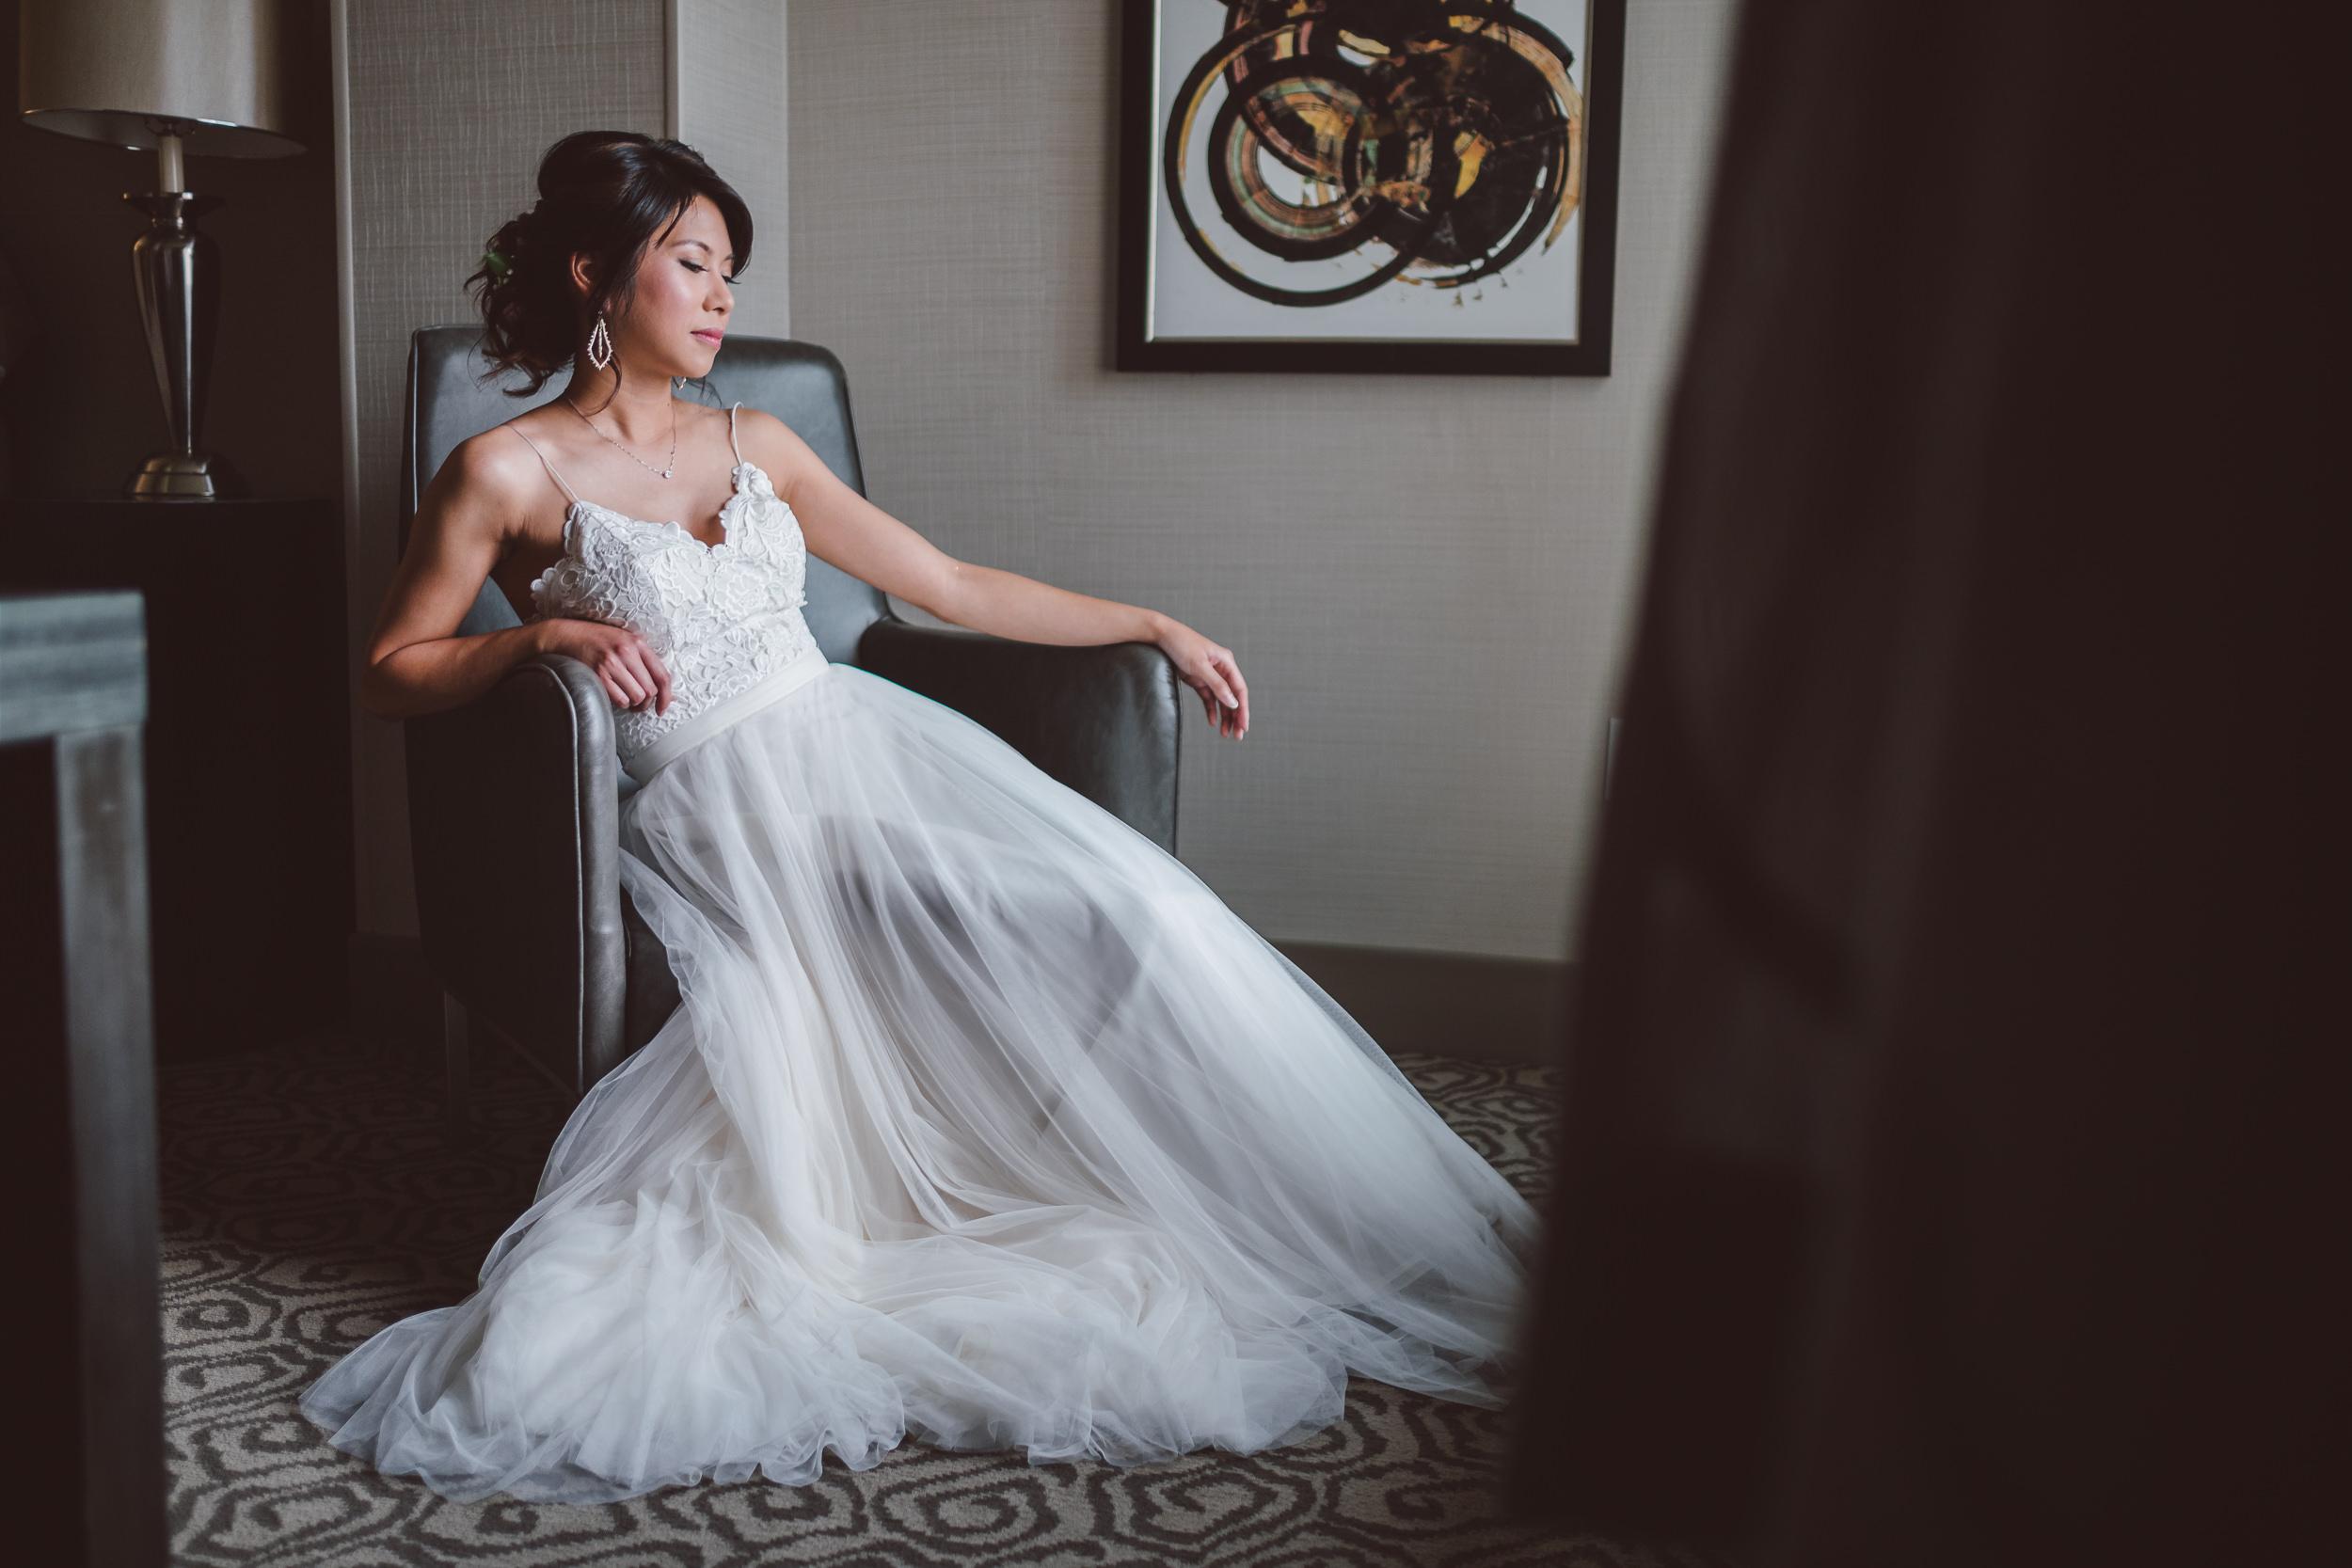 San-Francisco-City-Hall-Wedding-Photography-016.jpg